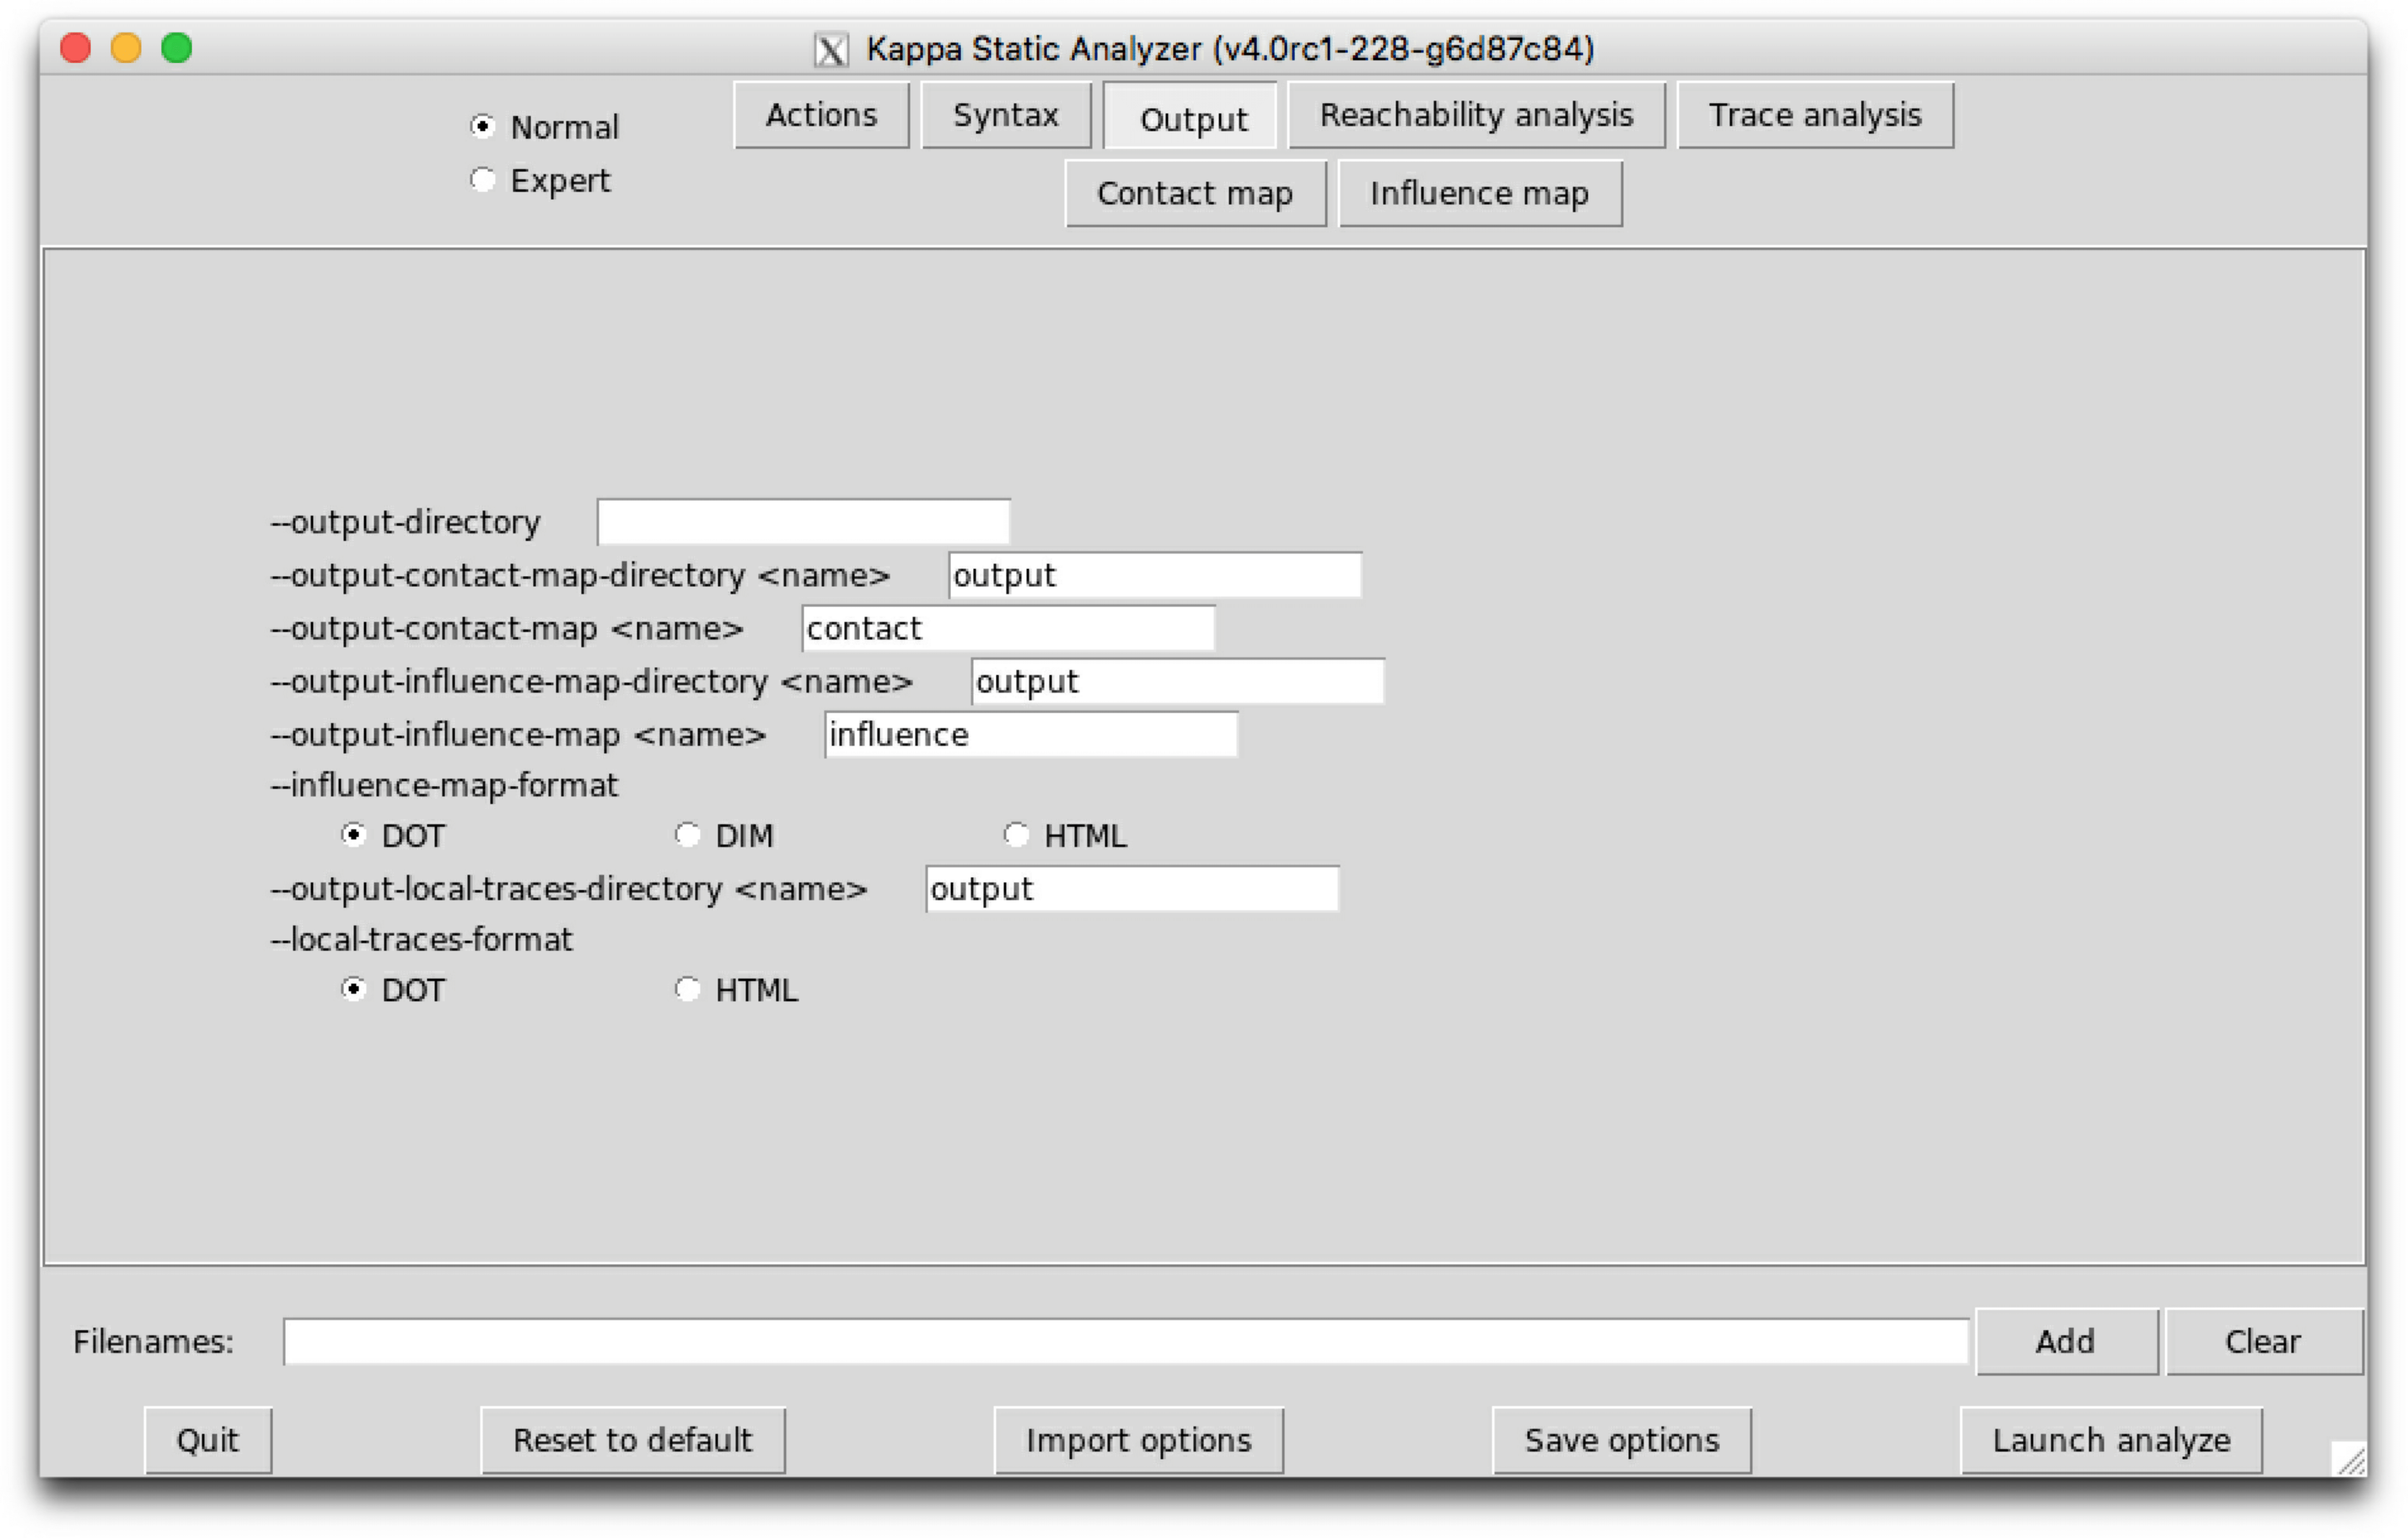 инструкция работаты с advanced tokens manager v3 5